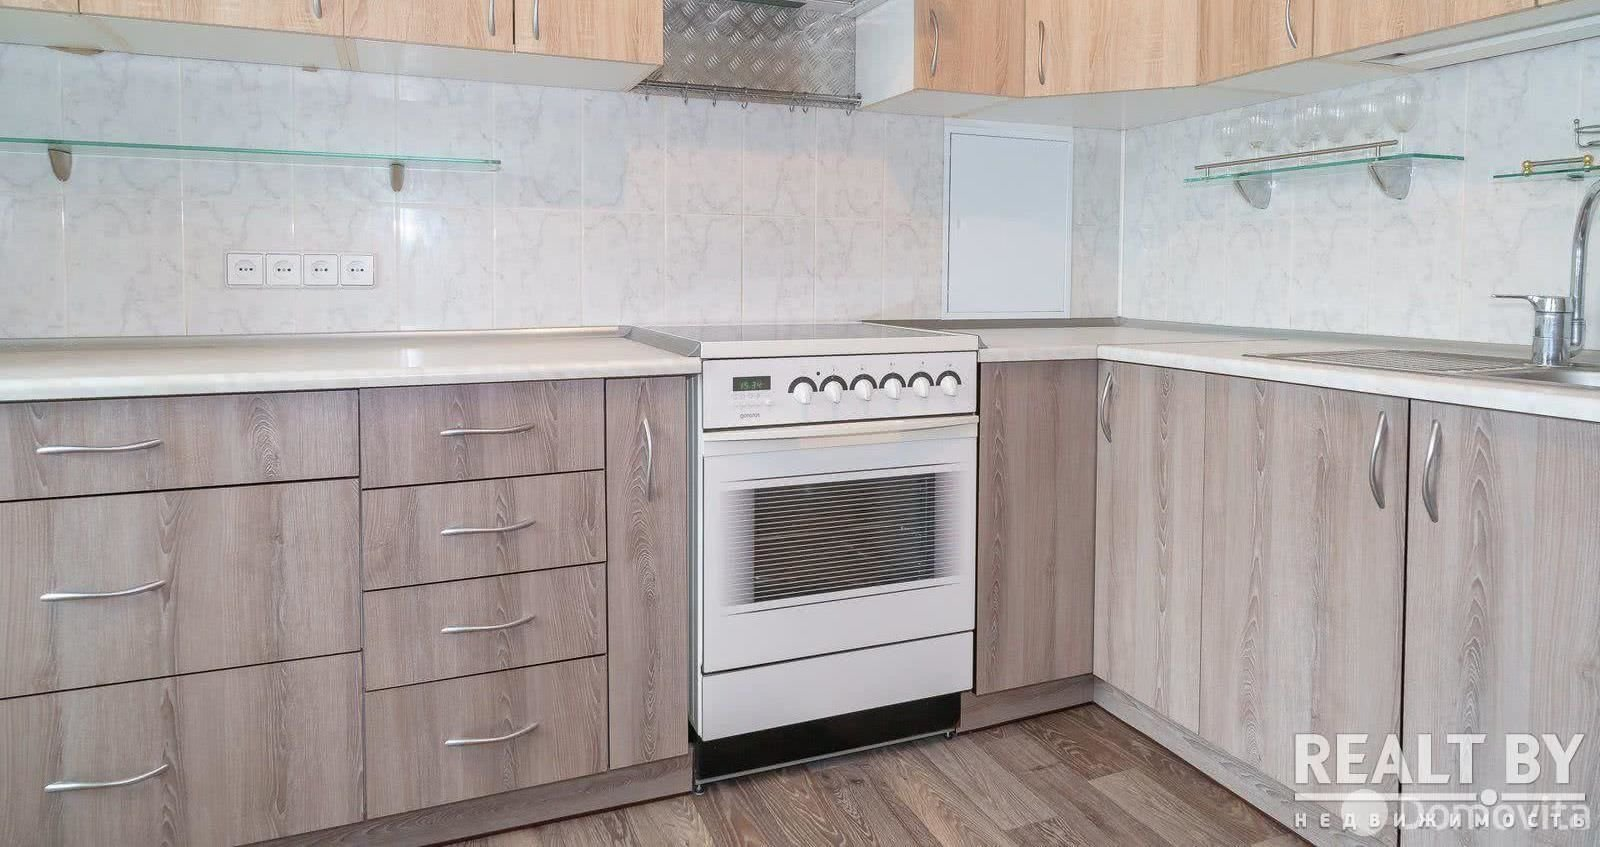 Продажа 3-х комнатной квартиры в г. Минске, ул. Кулибина, дом 11 (р-н Михалово). Цена 226 808 руб